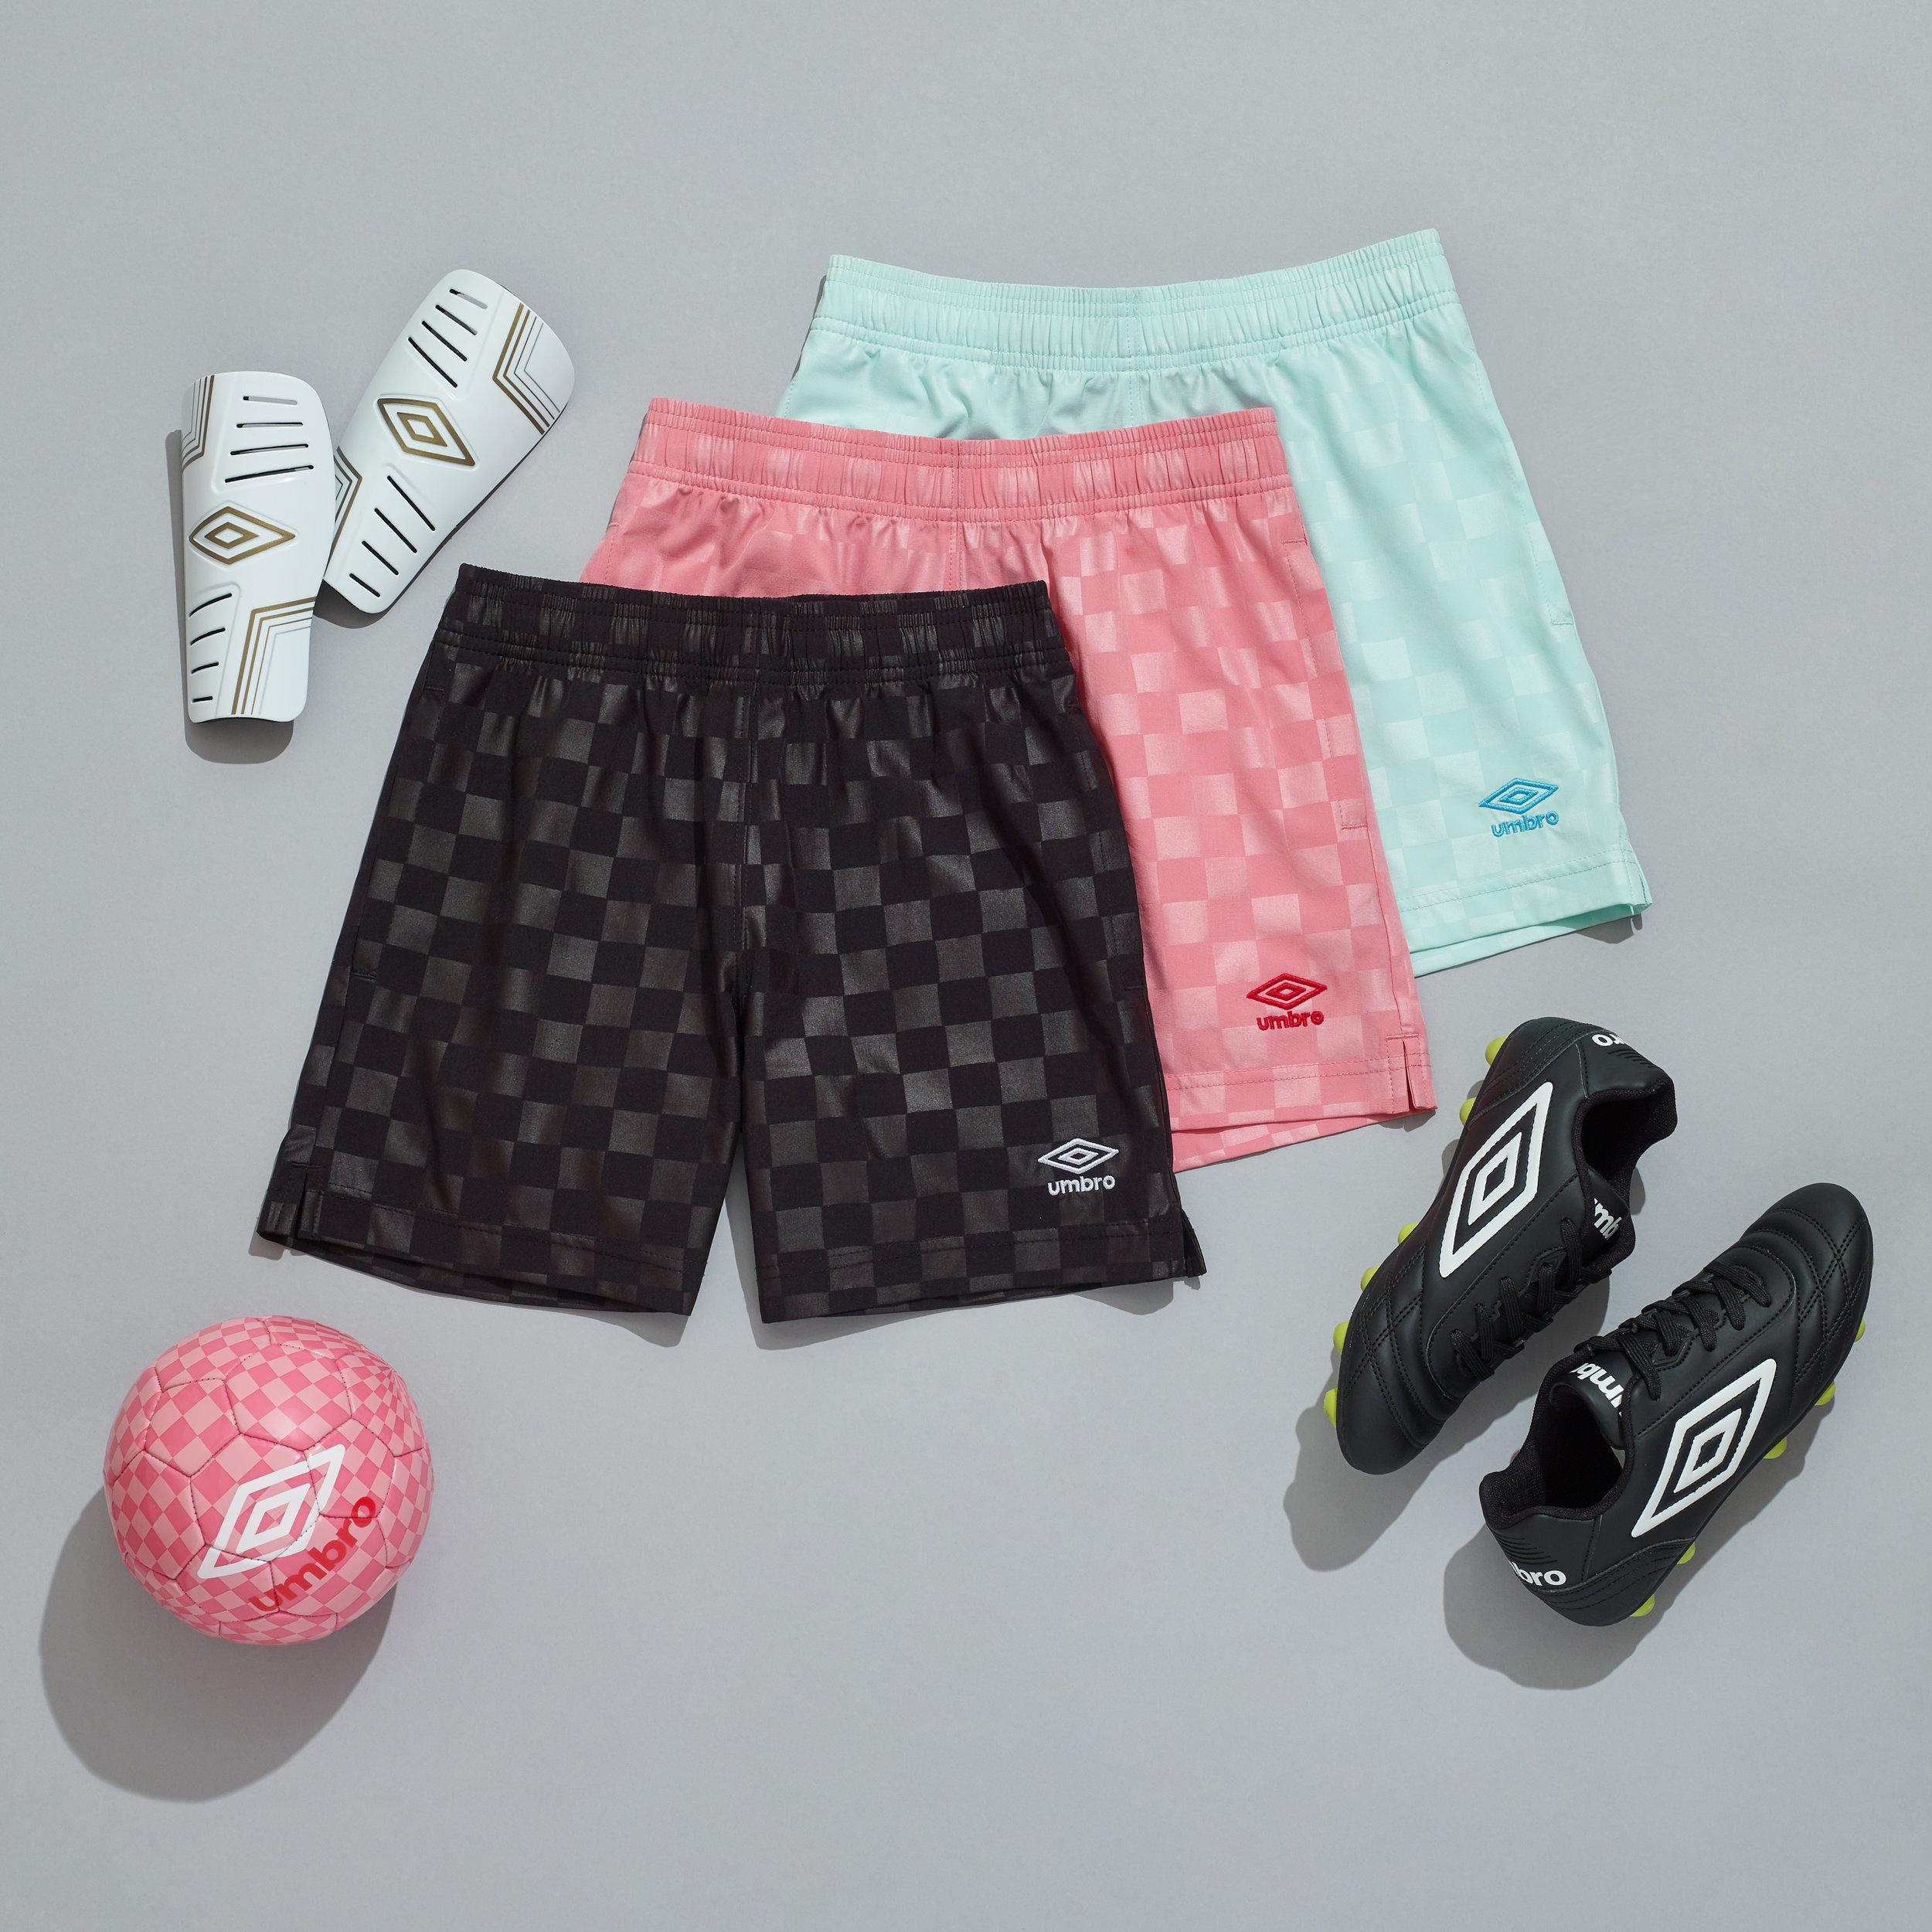 S19_GIRLS_Target_Shorts_152 copy.jpg